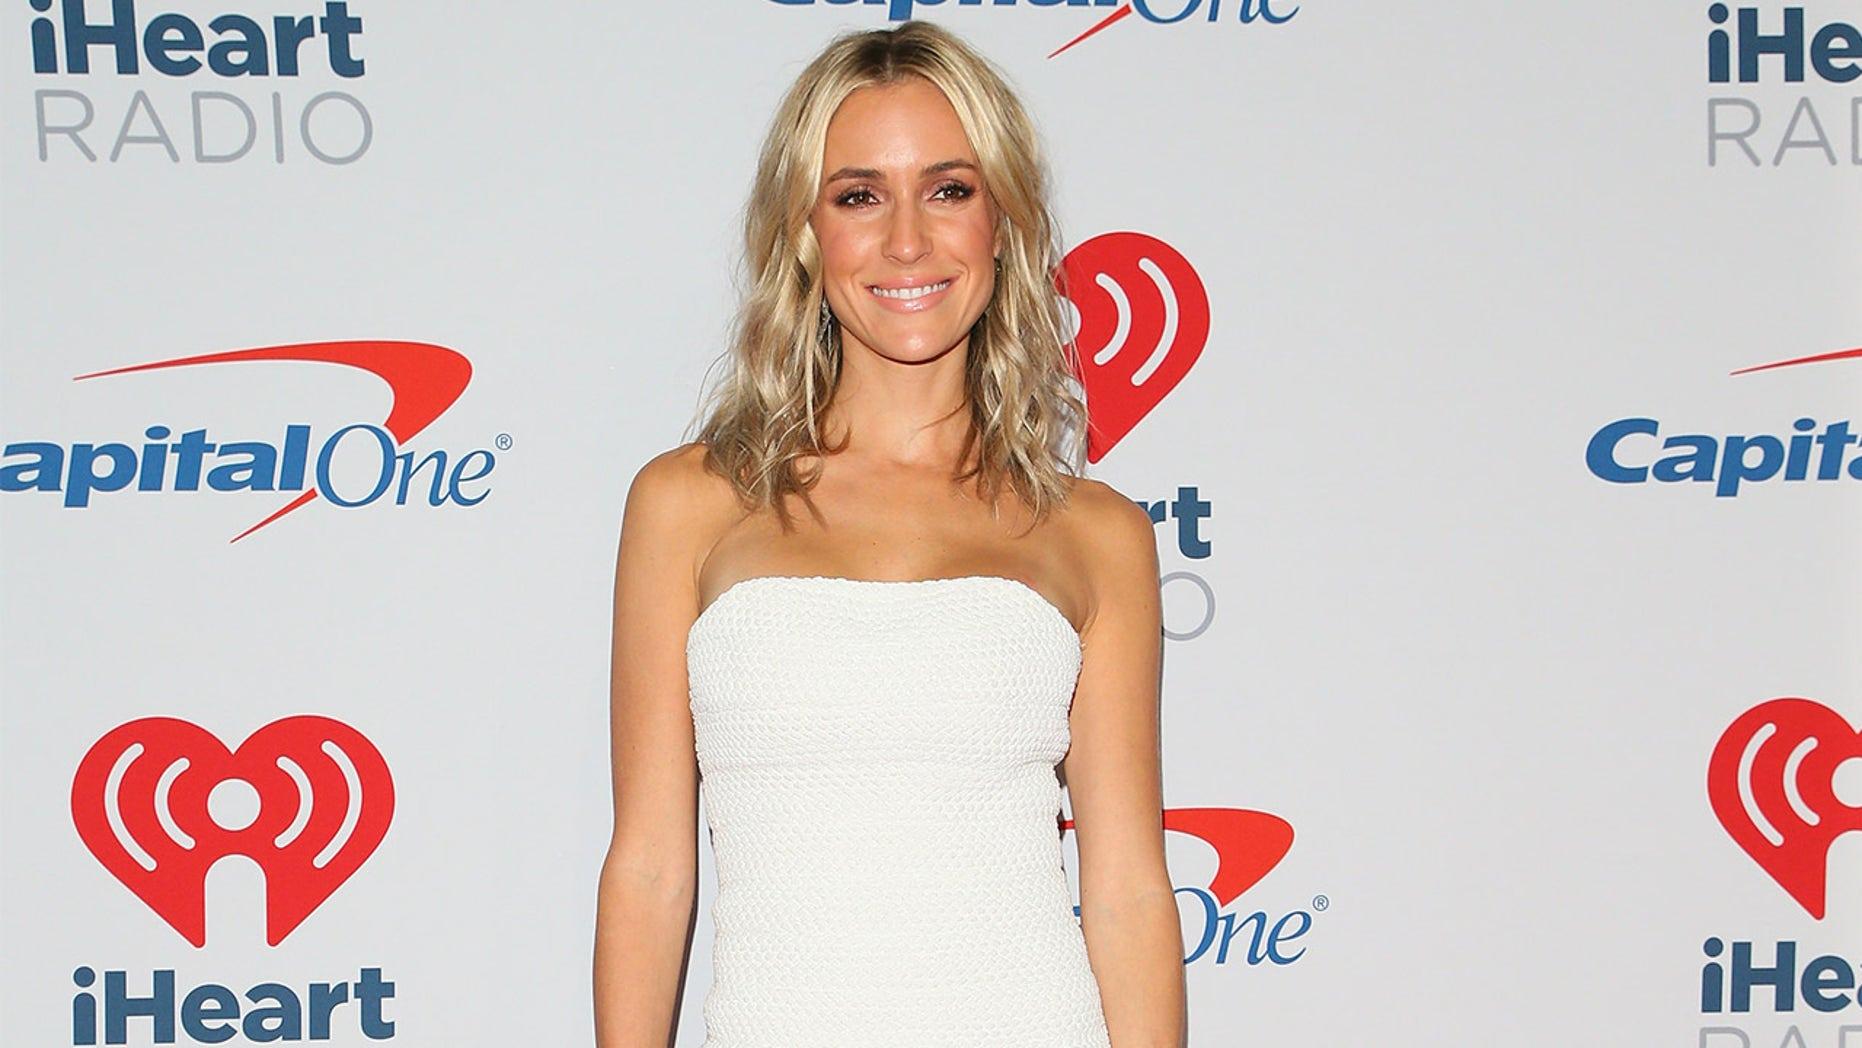 27ea93cadd20 Kristin Cavallari talked to reporters at the iHeartRadio Music Festival in  Las Vegas on Sept.